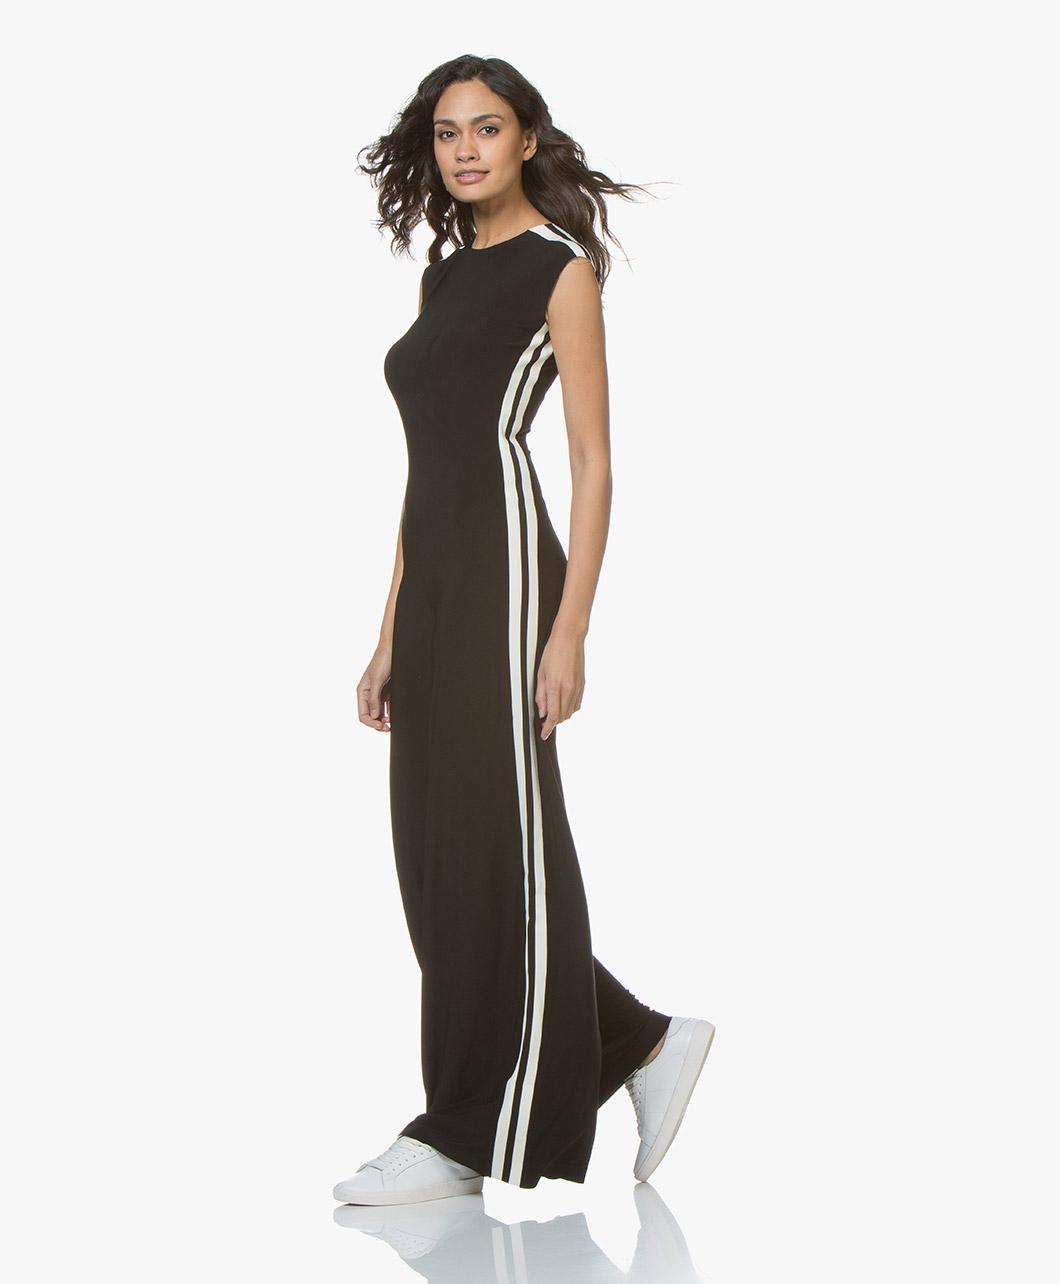 8aa5fd1c11d4 Norma Kamali Side Stripe Sleeveless Travel Jersey Jumpsuit - Black Off-white  Stripe - Norma Kamali